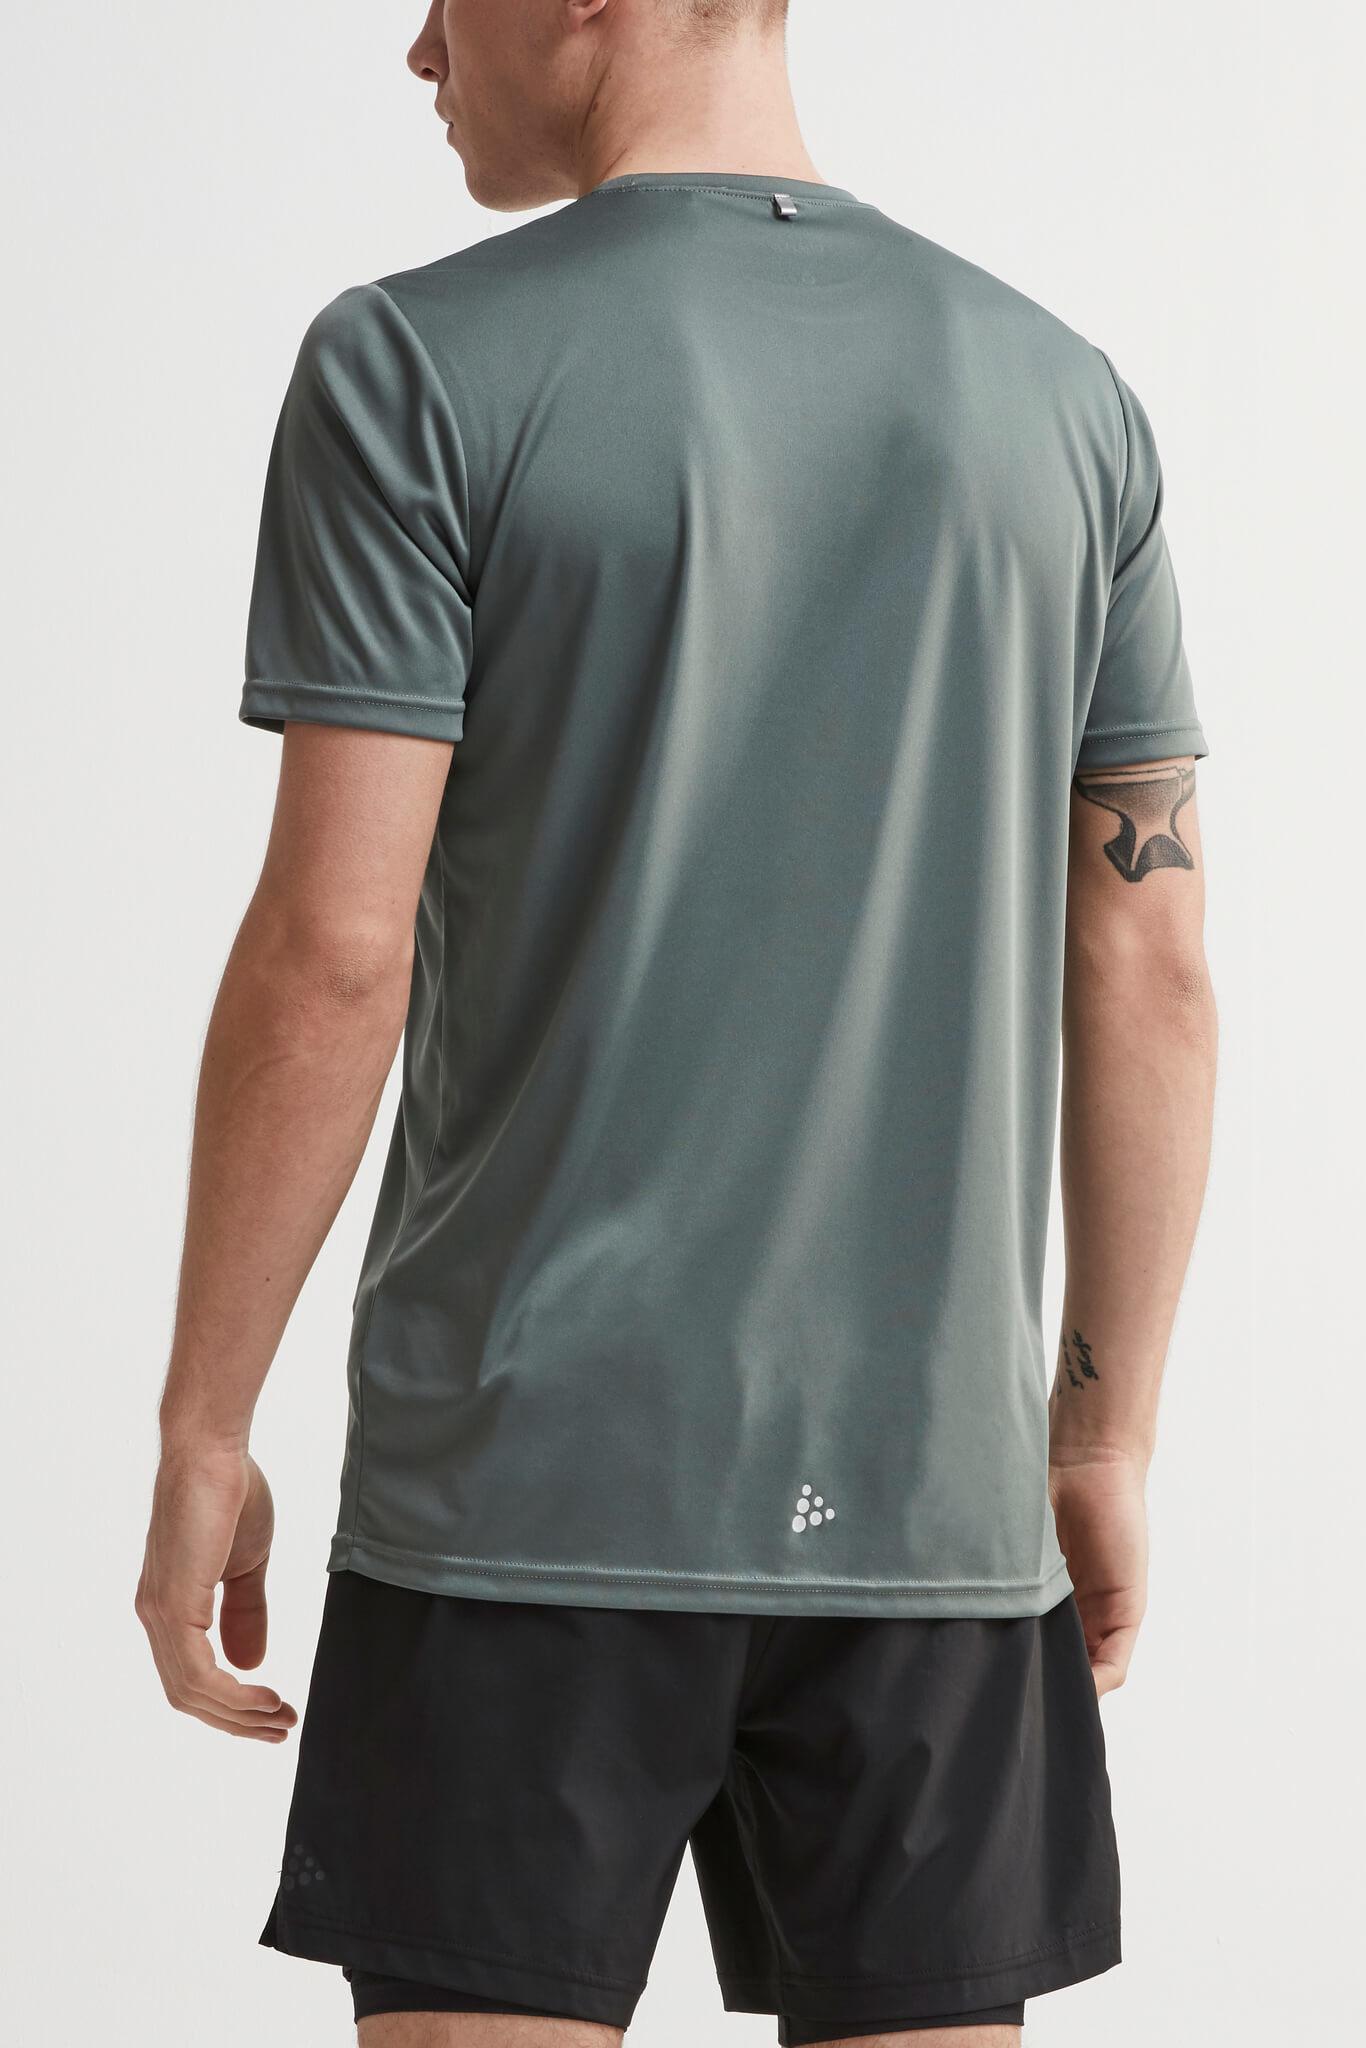 Craft Eaze SS Graghic футболка спортивная мужская - 3